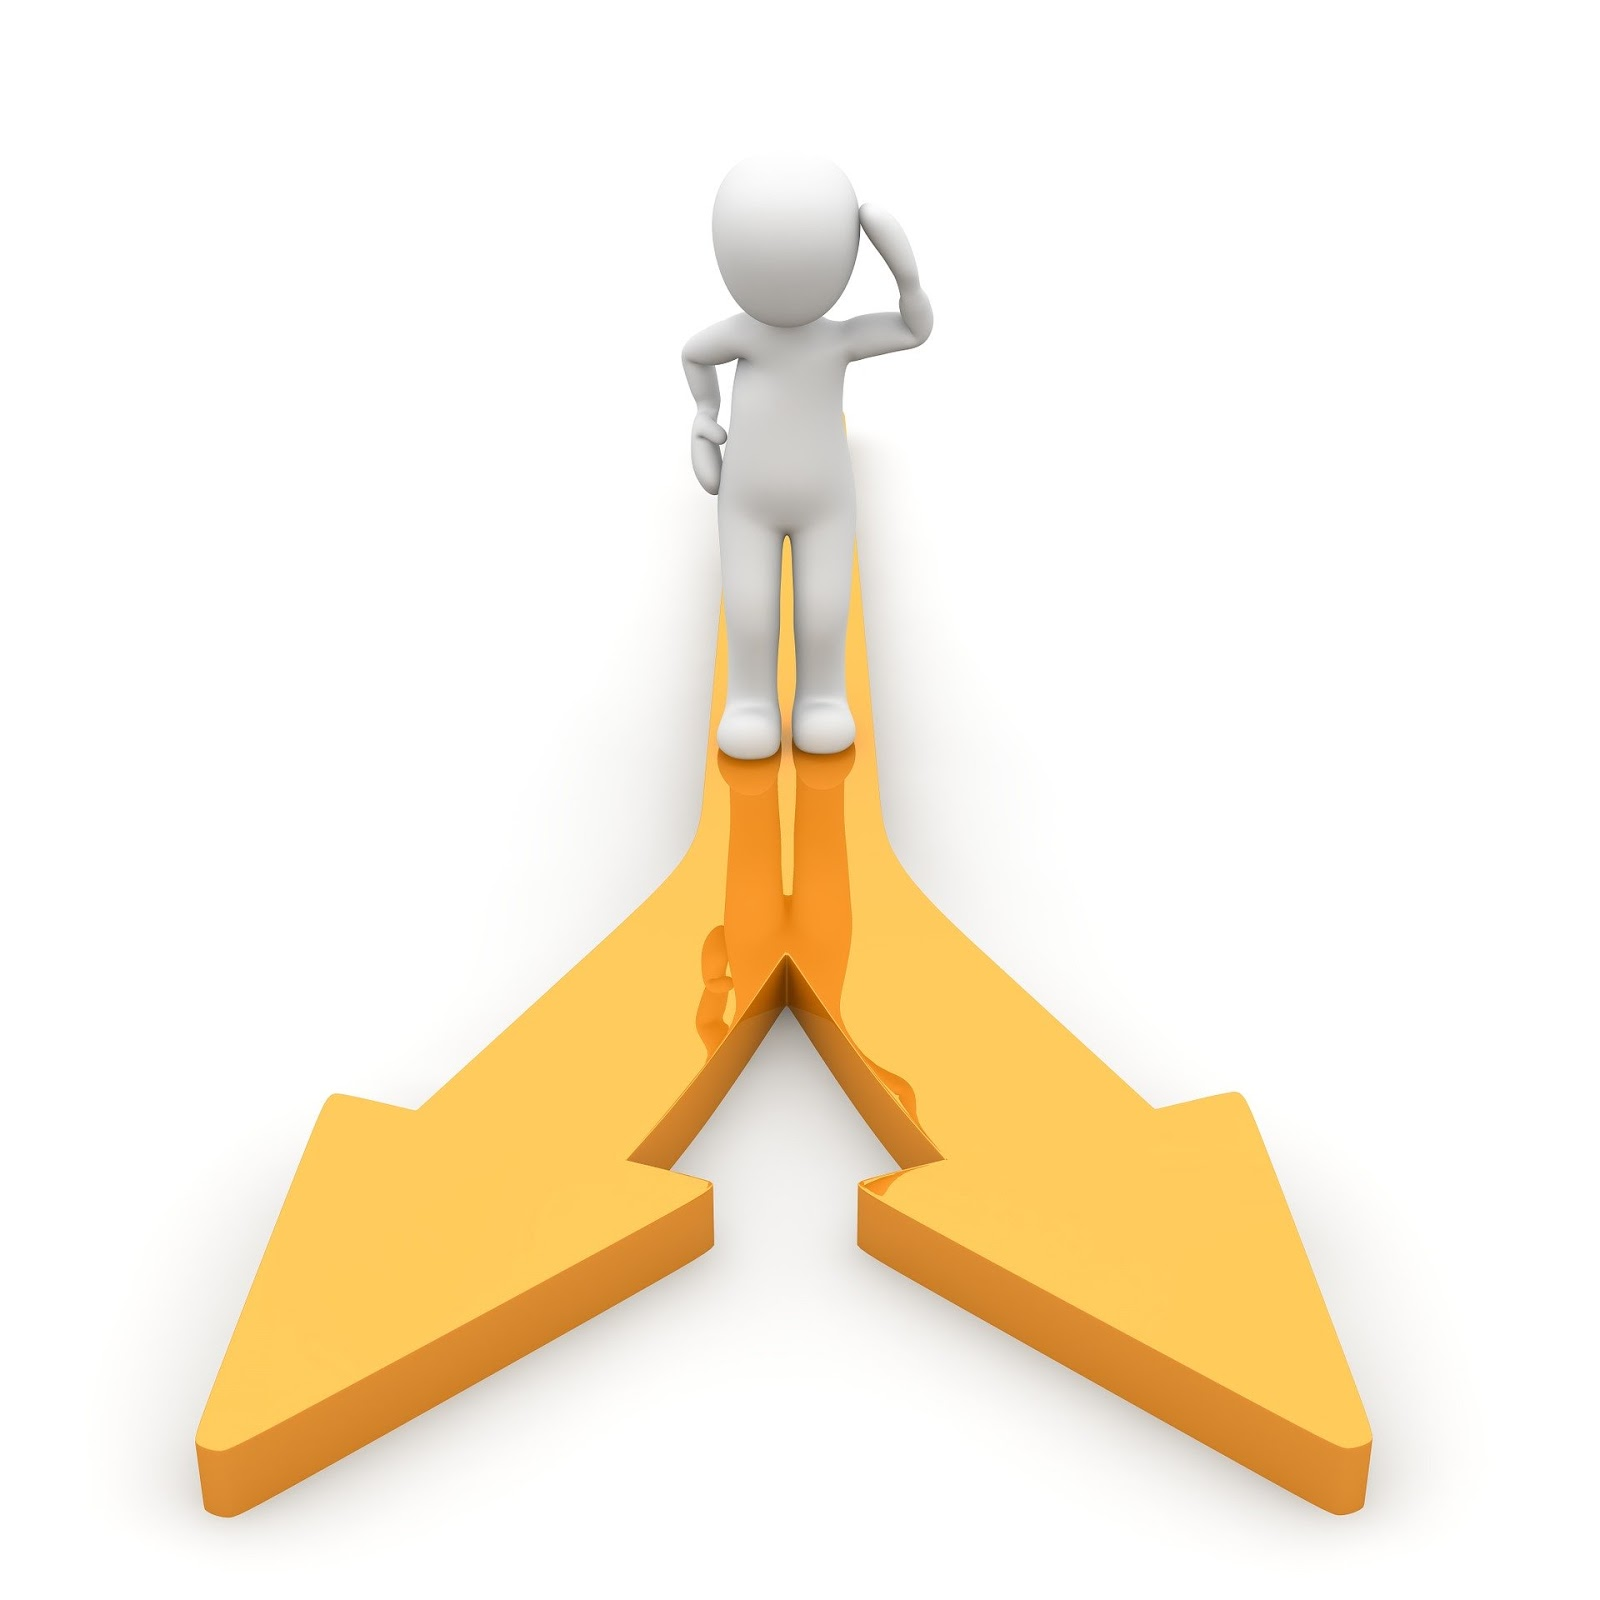 خطوات اتخاذ القرار السليم,اتخاذ القرار، اتخاذ القرار السليم، اتخاذ القرارات السليمة، اتخاذ القرارات وحل المشاكل